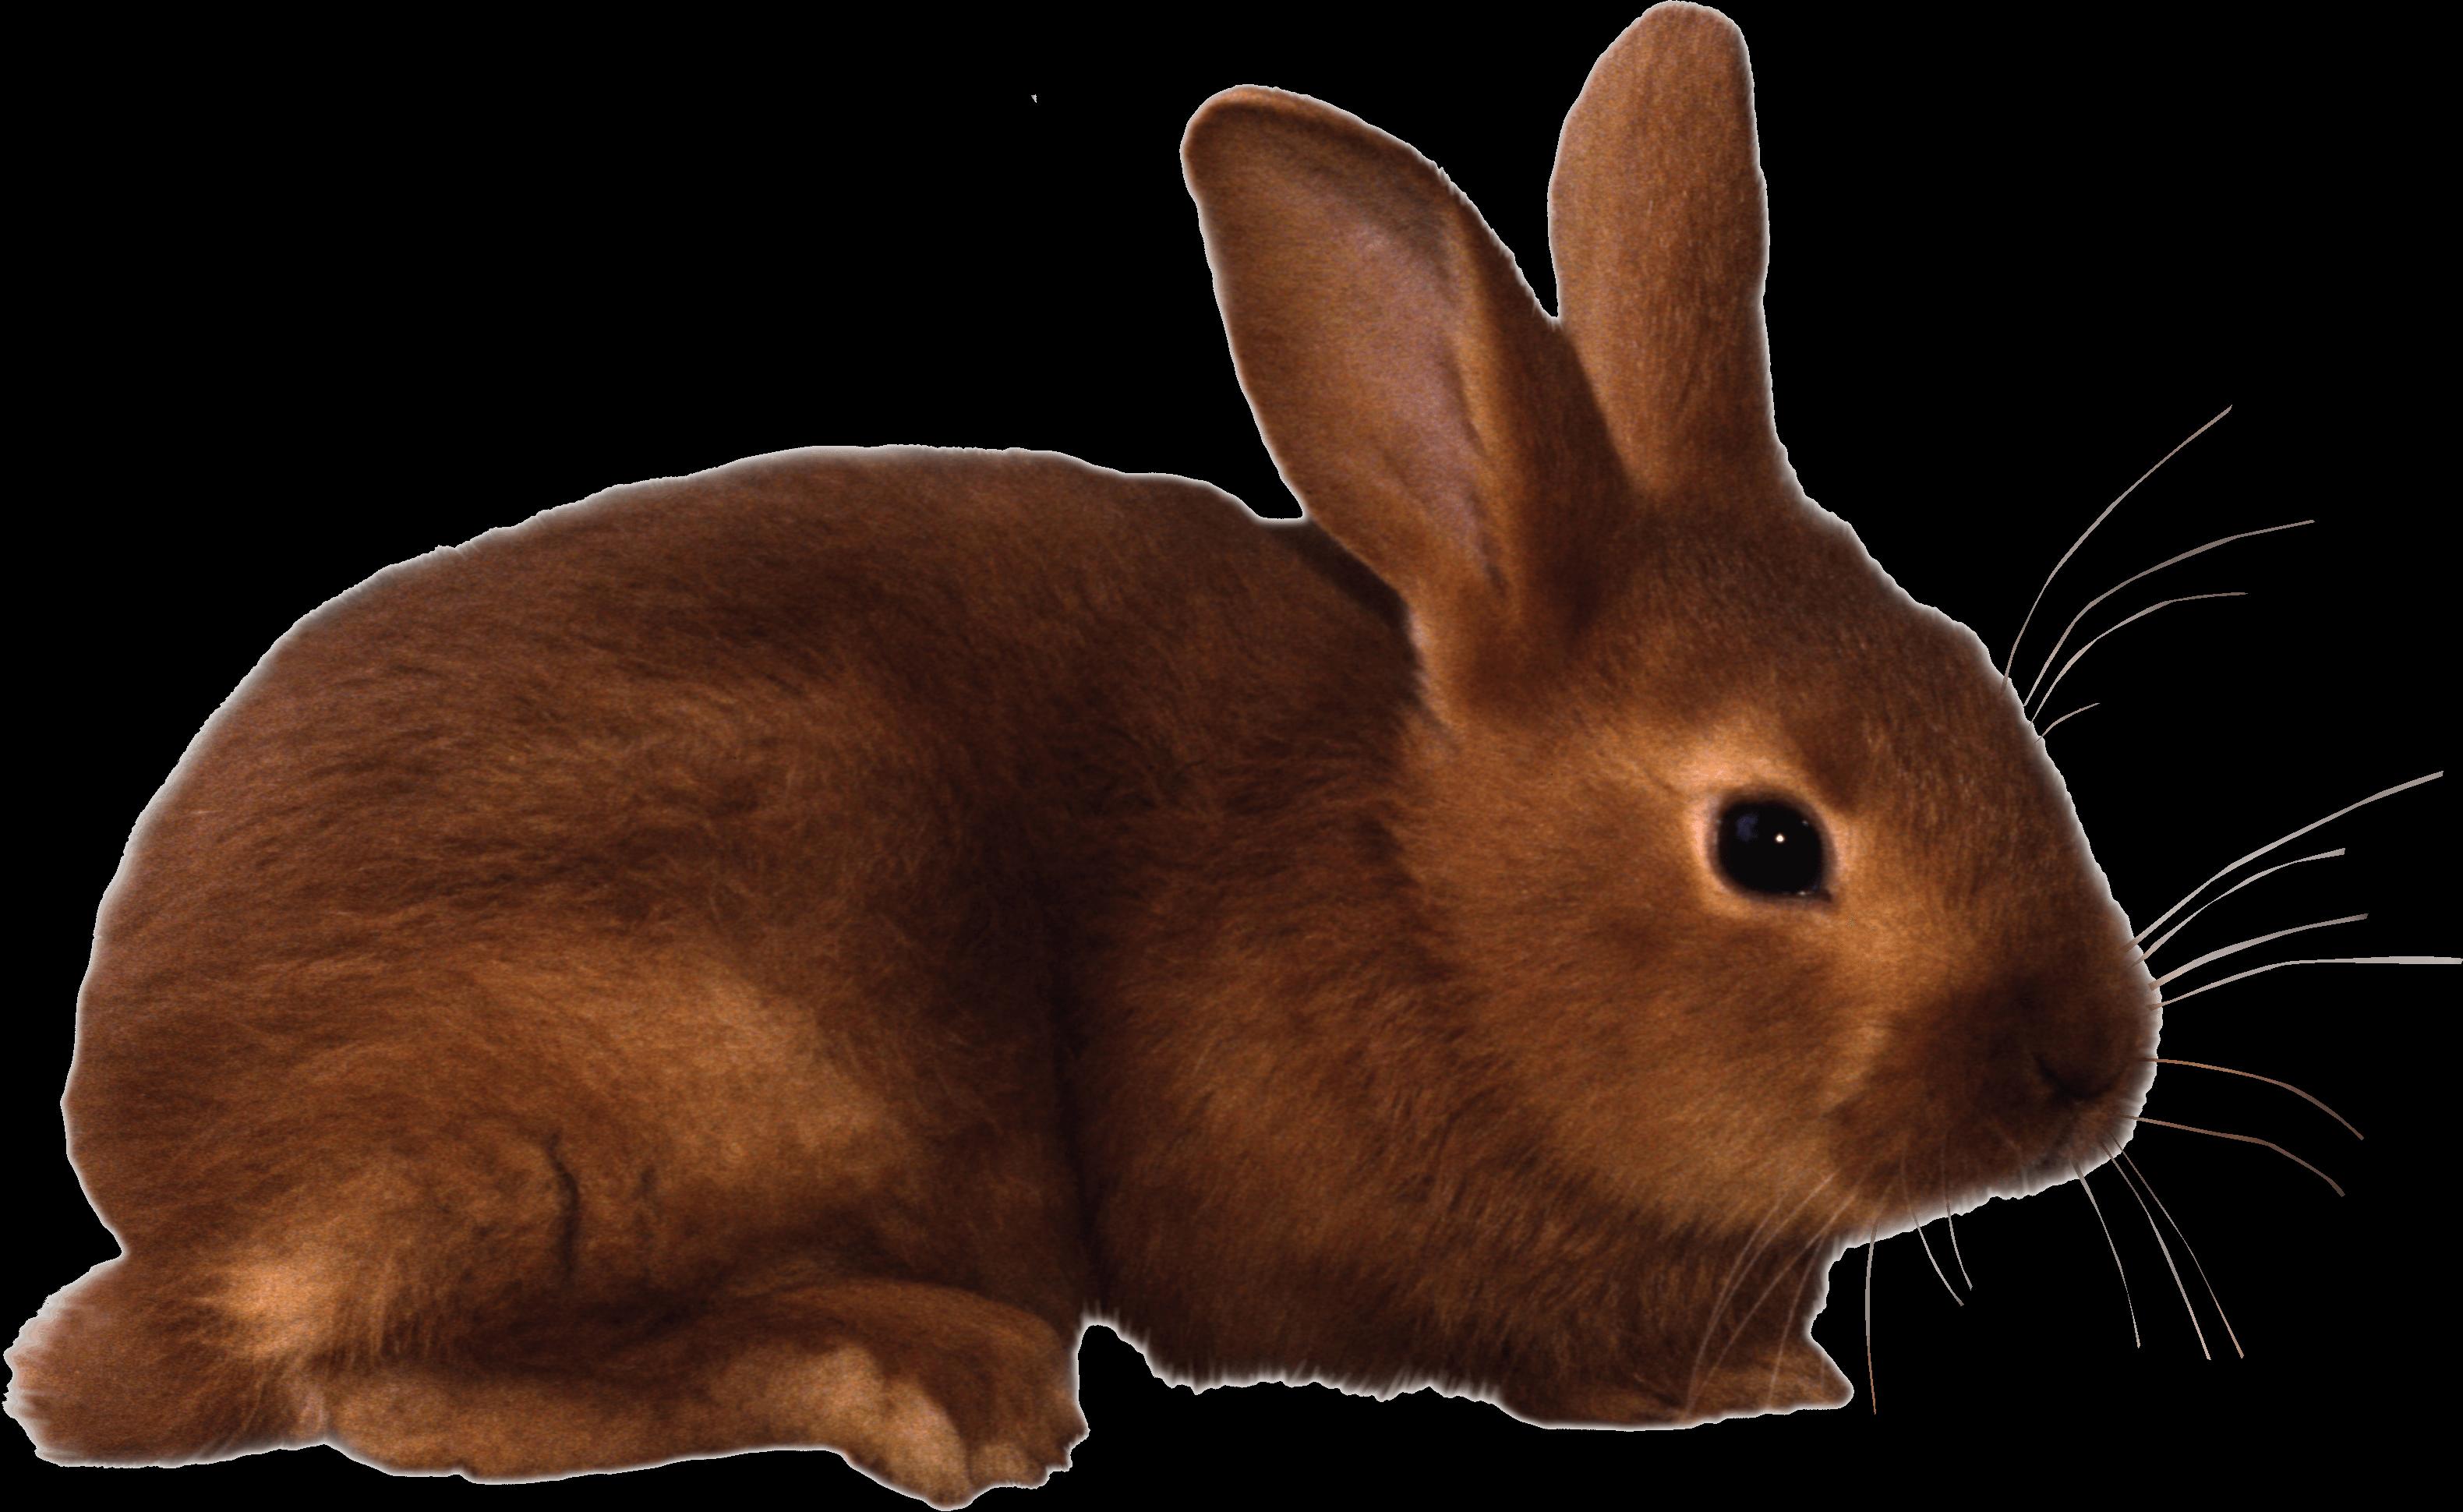 Brown rabbit PNG Image